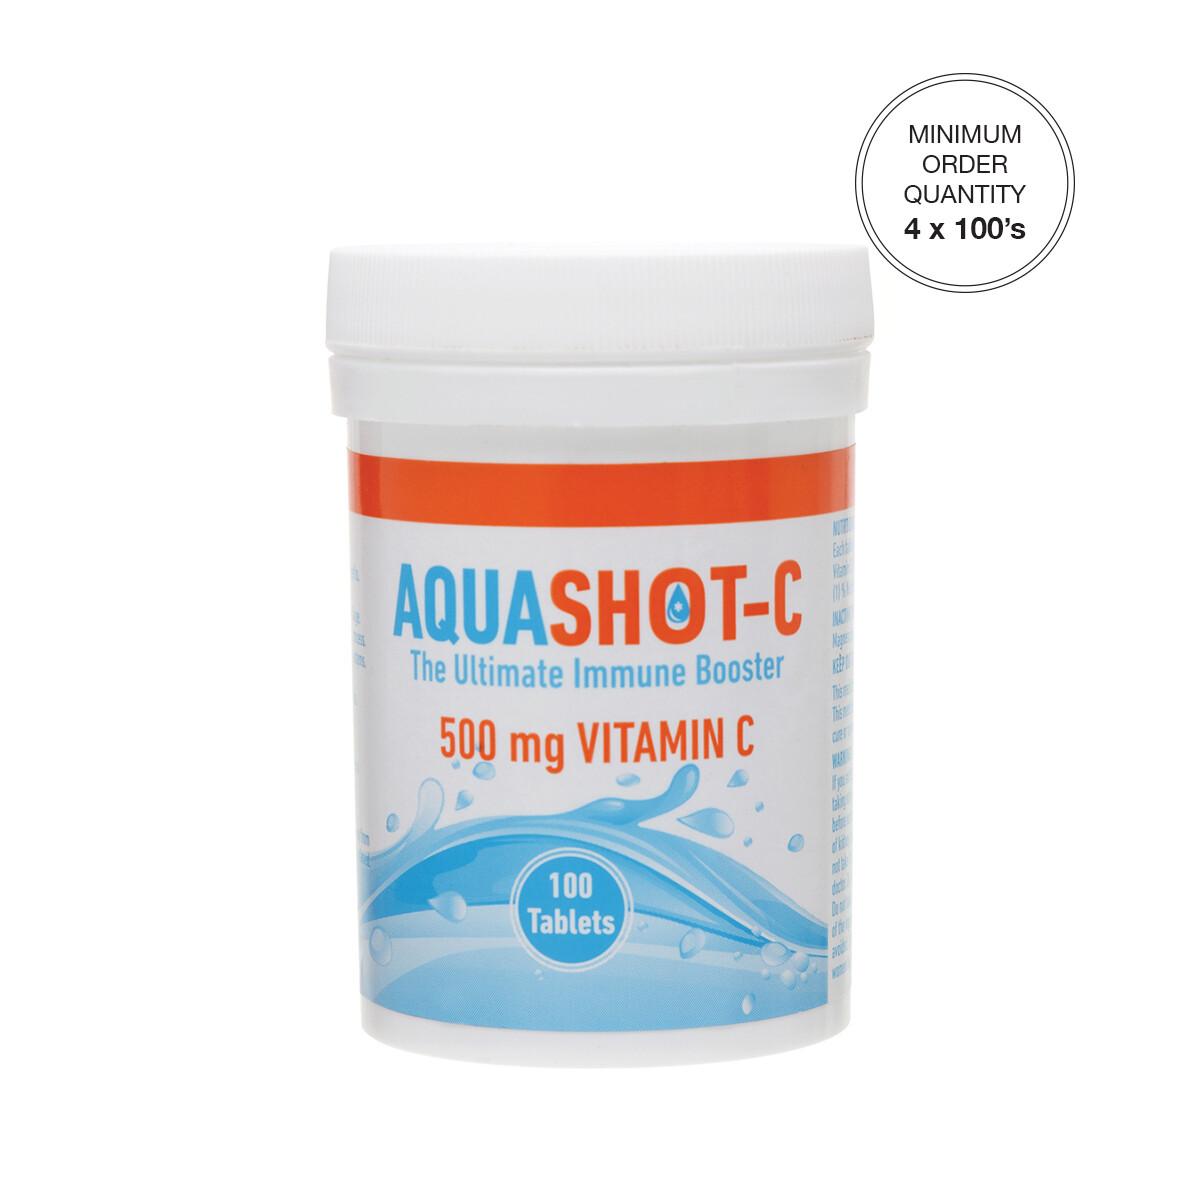 AQUASHOT-C 500 mg Vitamin C 100's Tablets [Min. order 4 x 100's]